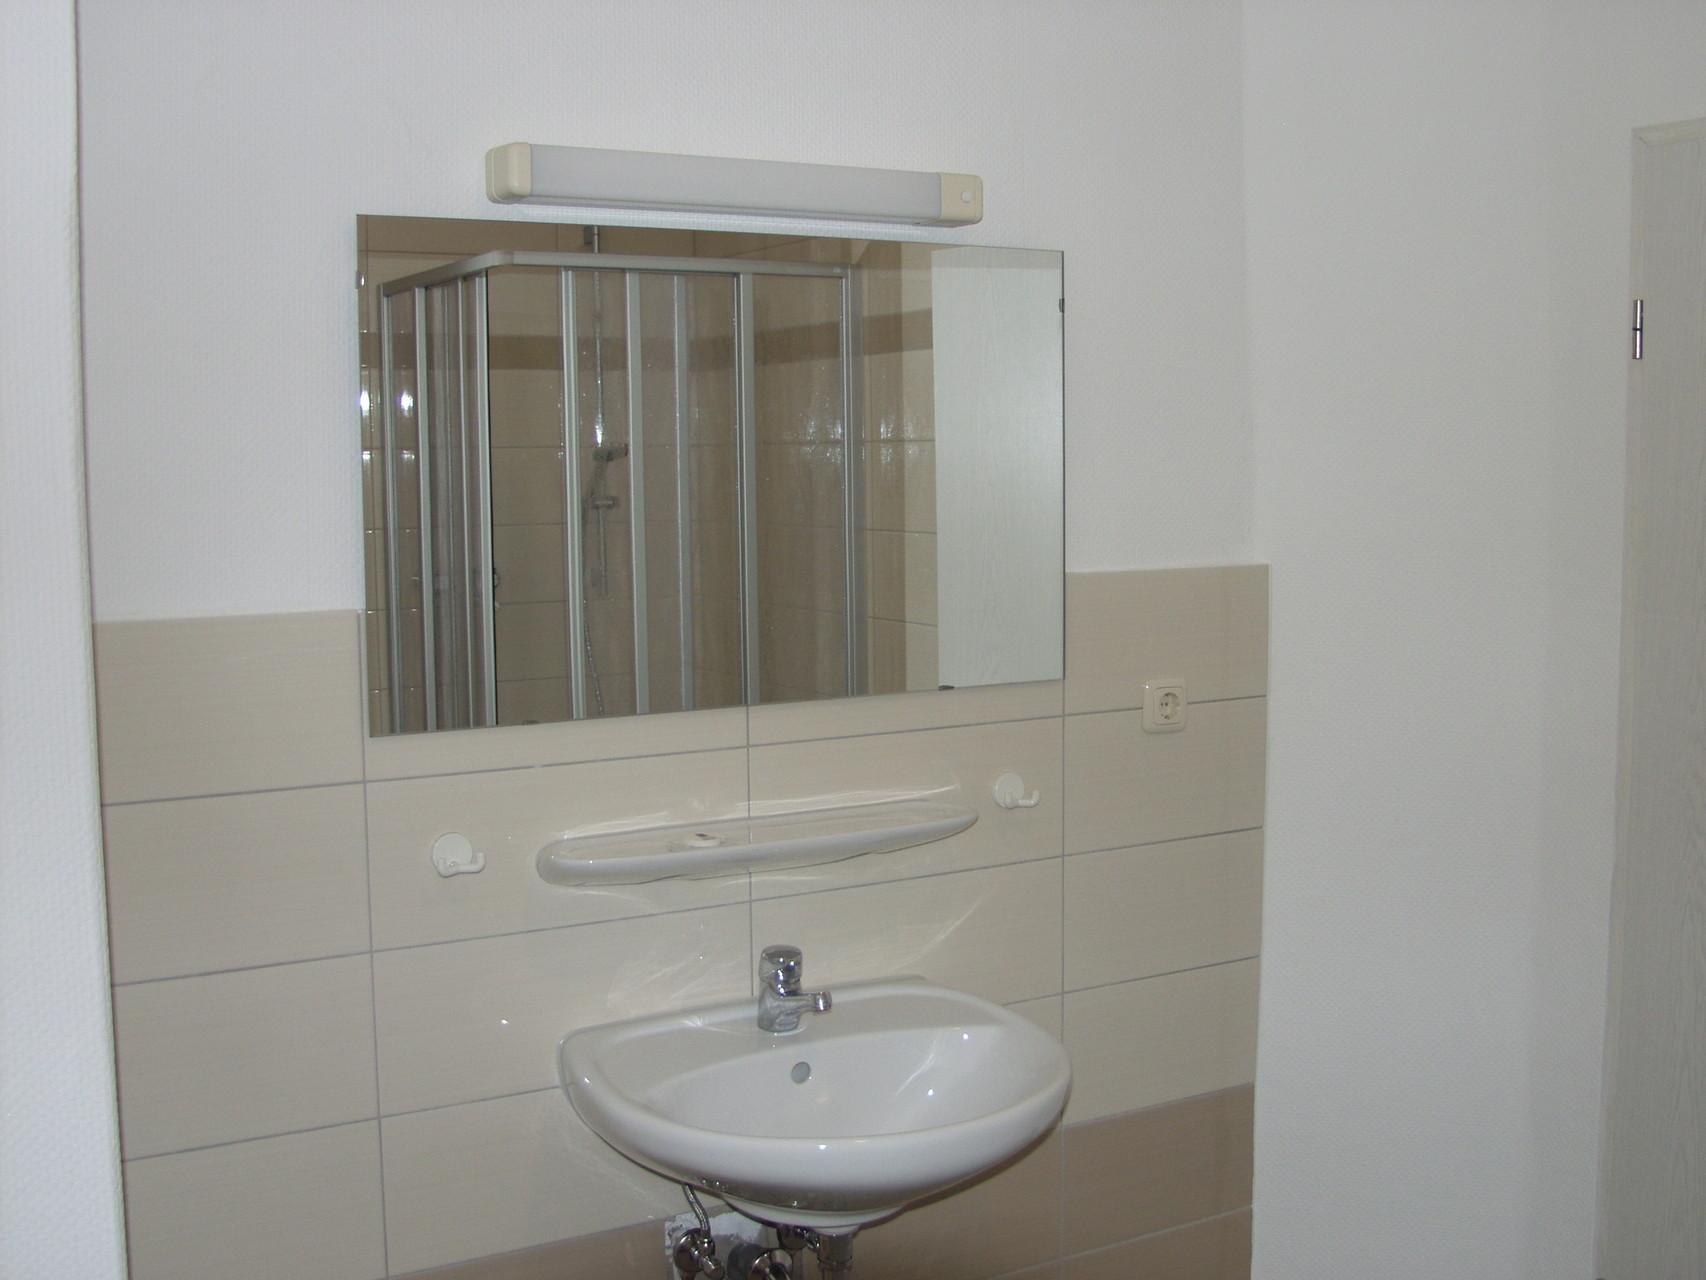 badezimmer vor dem umbau renovierungsprofi finn. Black Bedroom Furniture Sets. Home Design Ideas